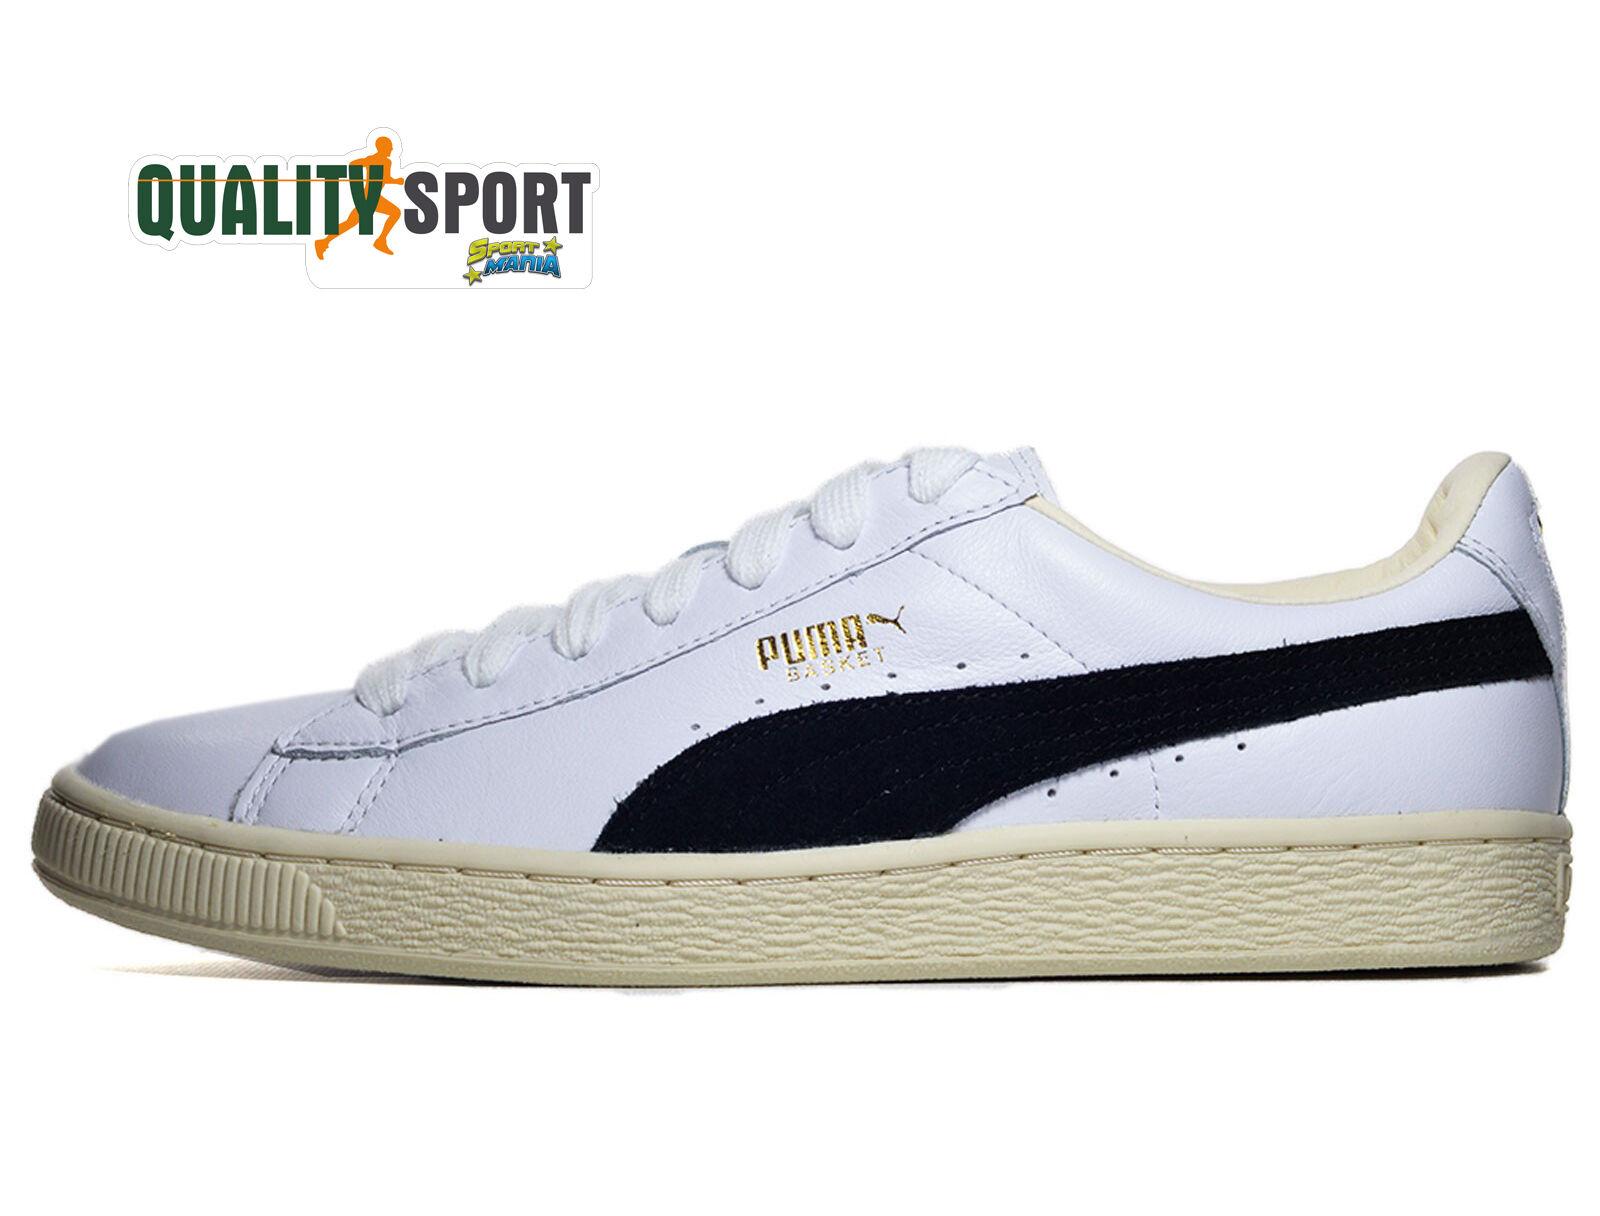 Puma Basket Classic Bianco black men shoes Sportive Sneakers 351912 03